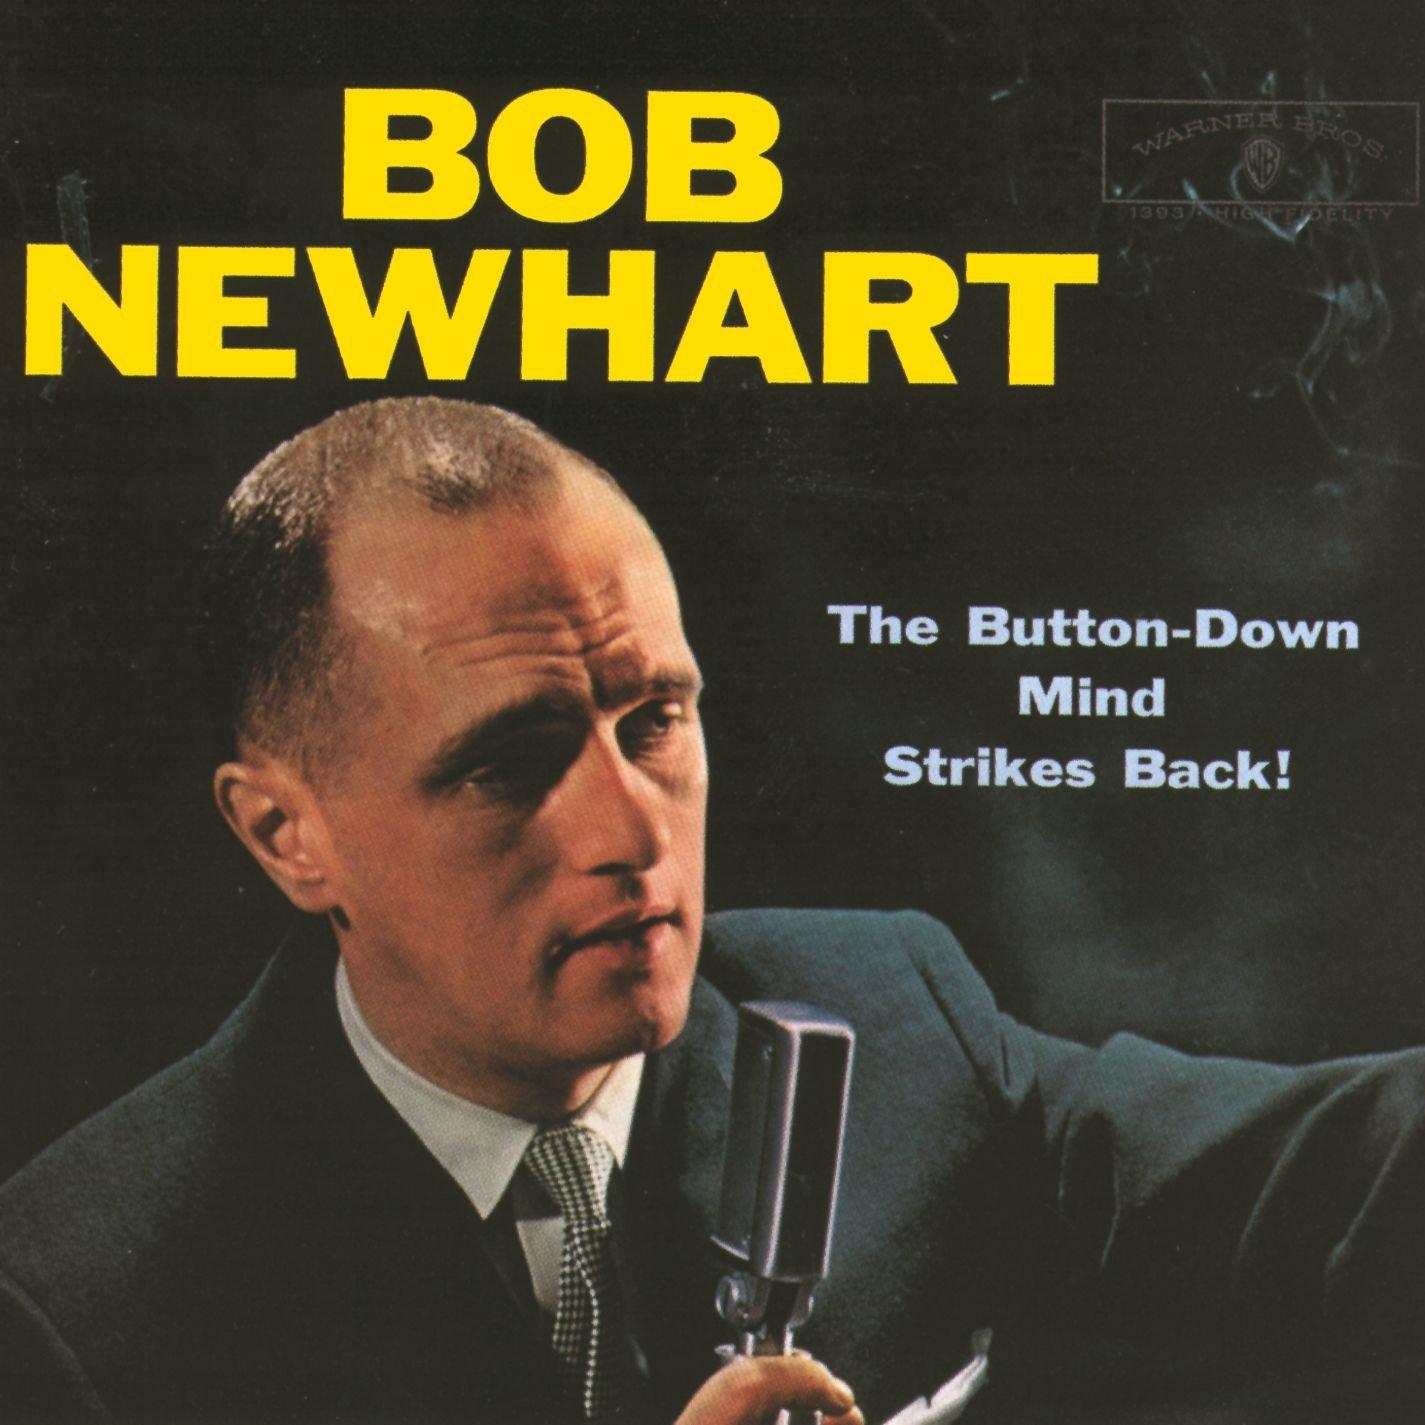 Bob Newhart - Button-Down Mind Strikes Back, The - Amazon.com Music